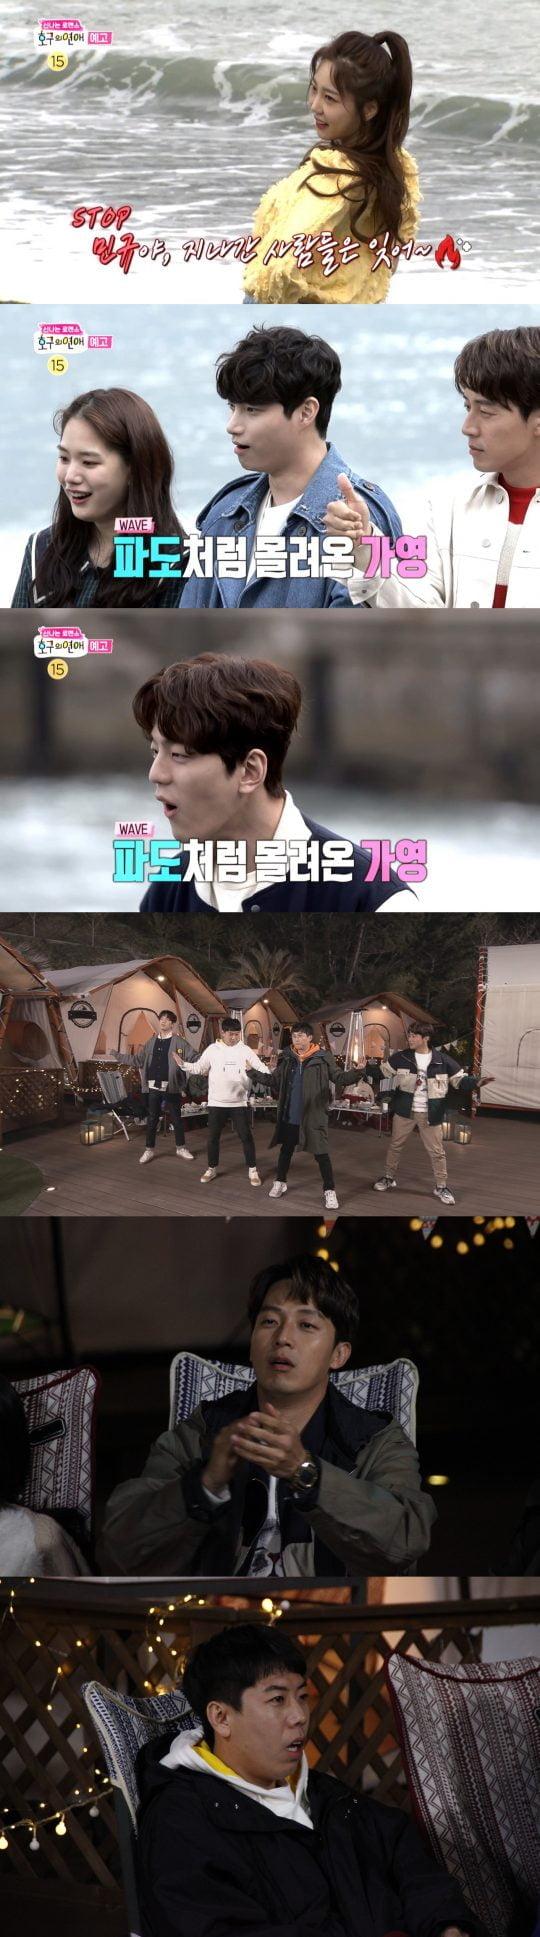 MBC '호구의 연애'/사진제공=MBC